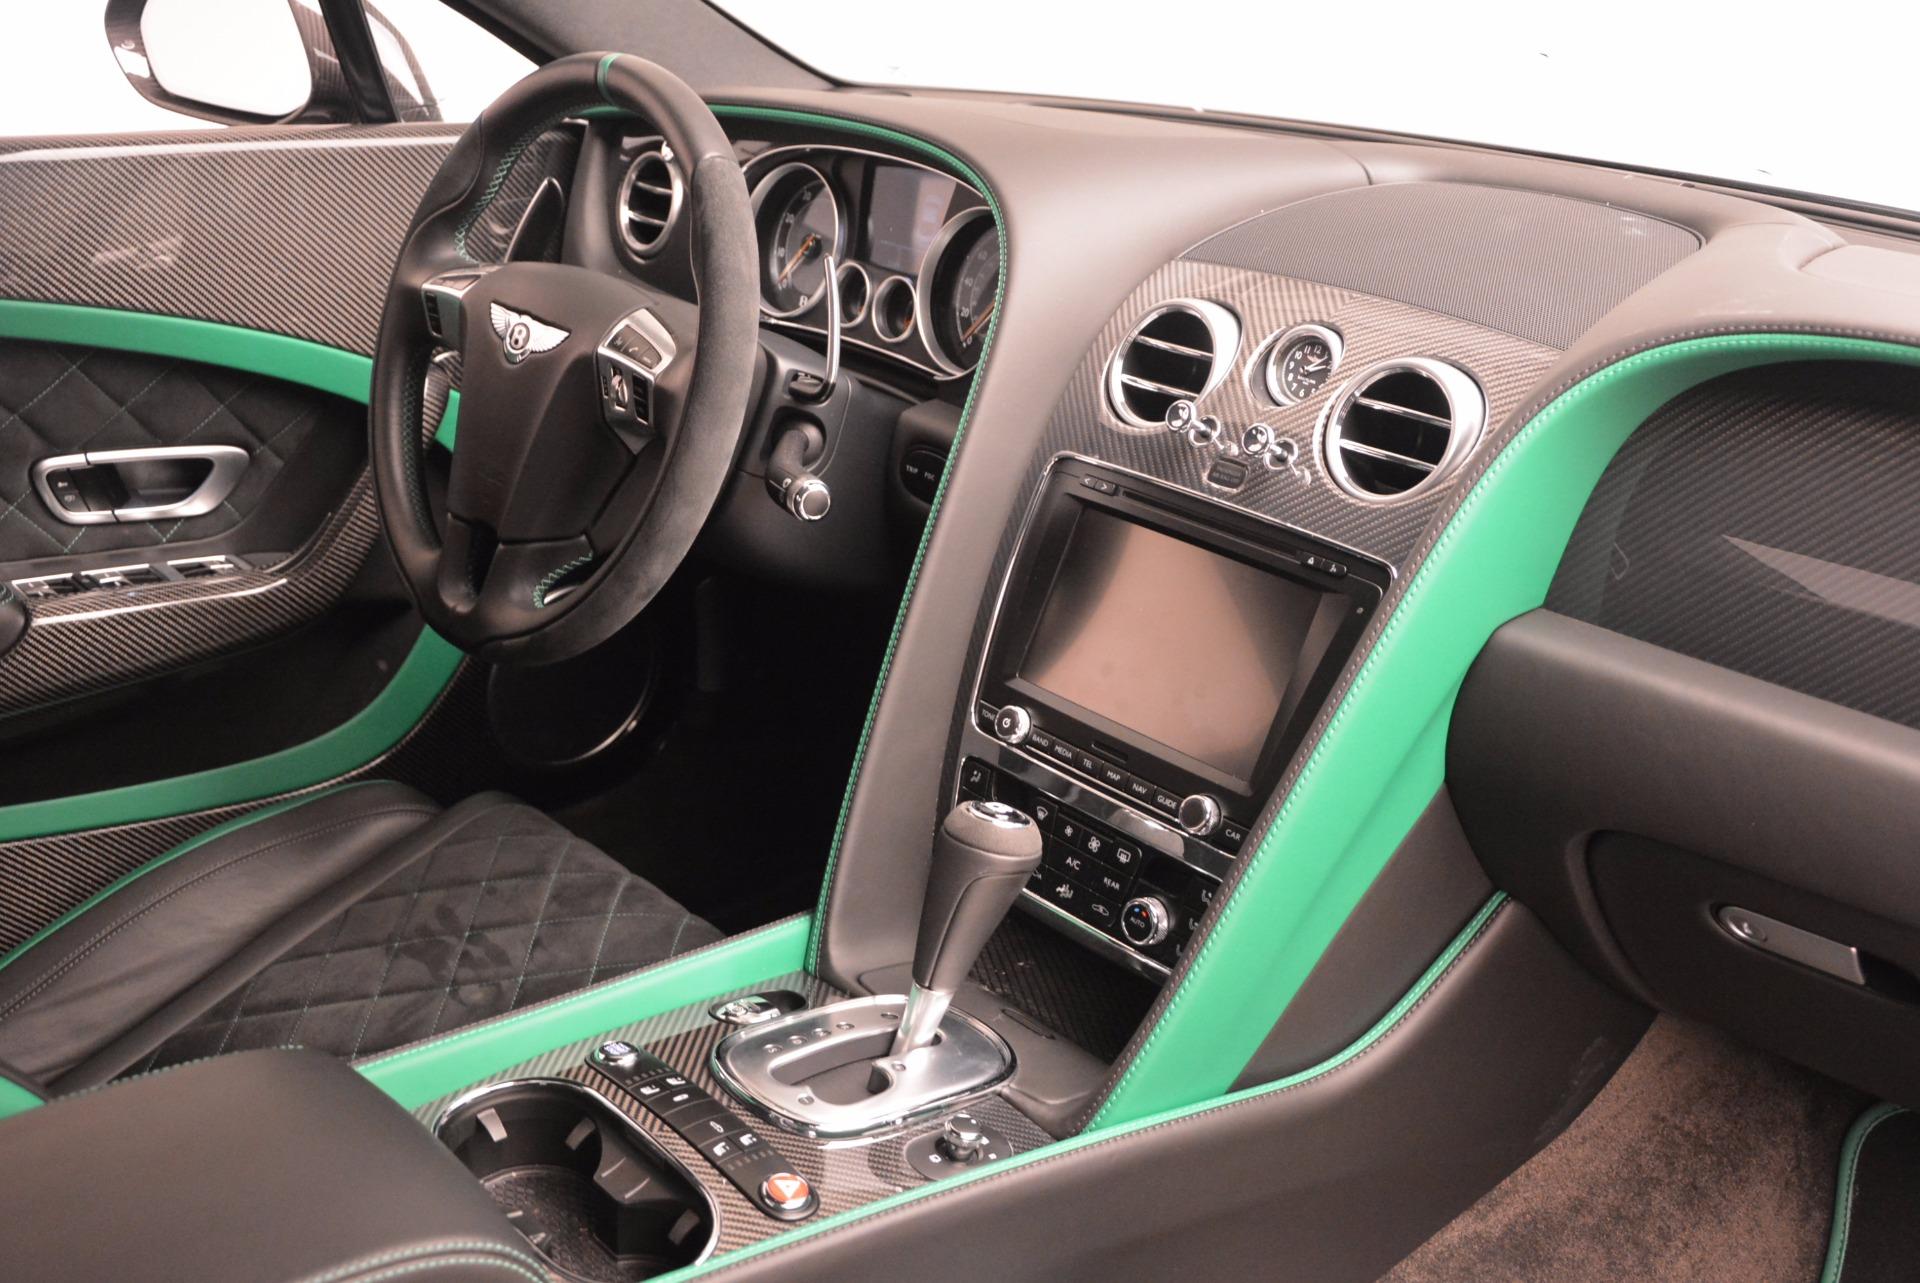 Used 2015 Bentley Continental GT GT3-R For Sale In Westport, CT 1002_p46